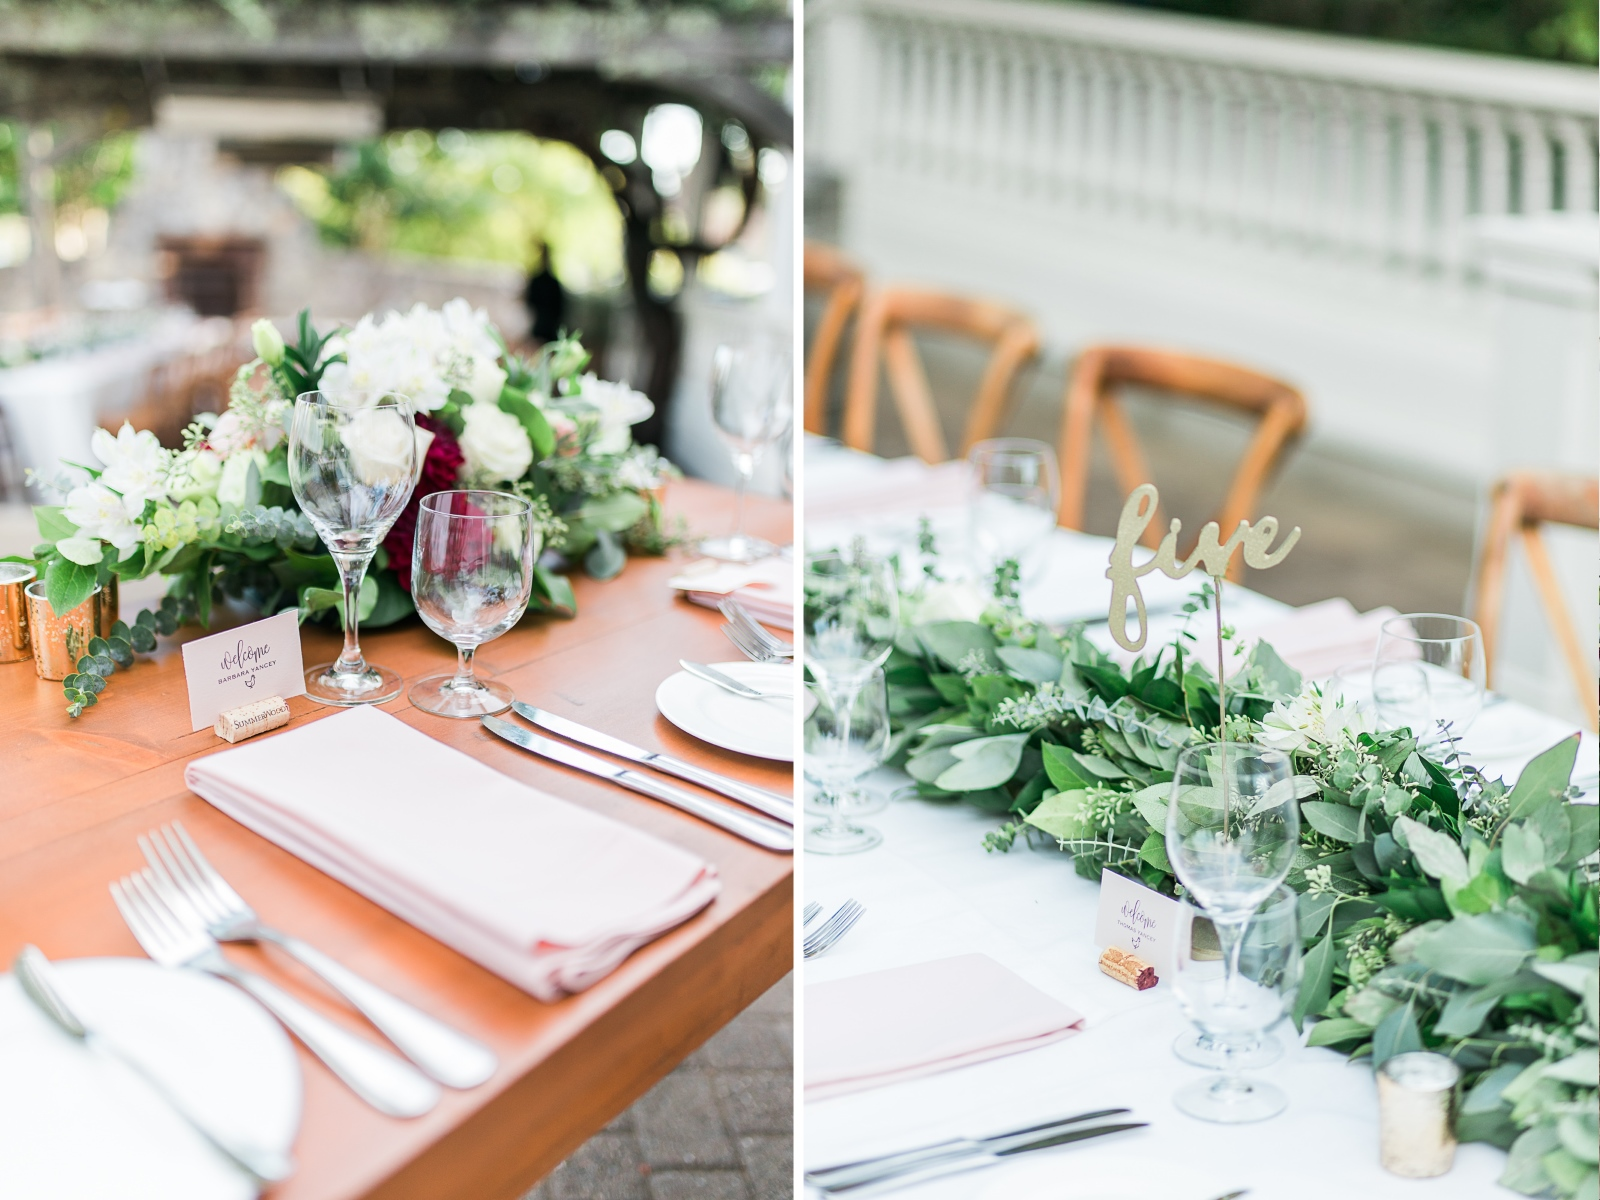 Generals+Daughter+Wedding+Photos+by+JBJ+Pictures+-+Ramekins+Wedding+Venue+Photographer+in+Sonoma+Napa+(23).jpg